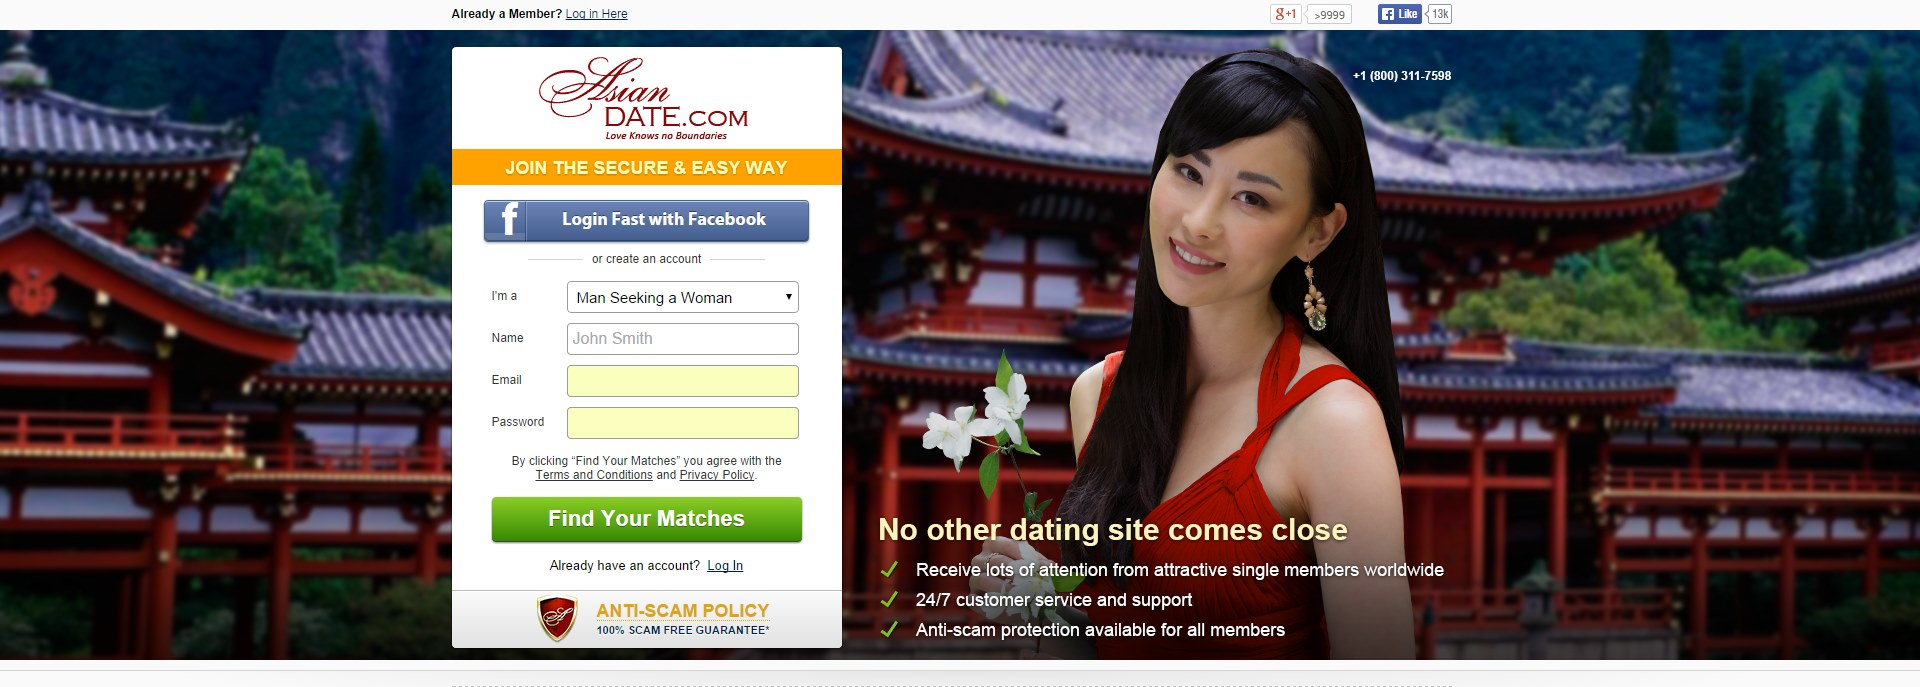 asiandateco homepage